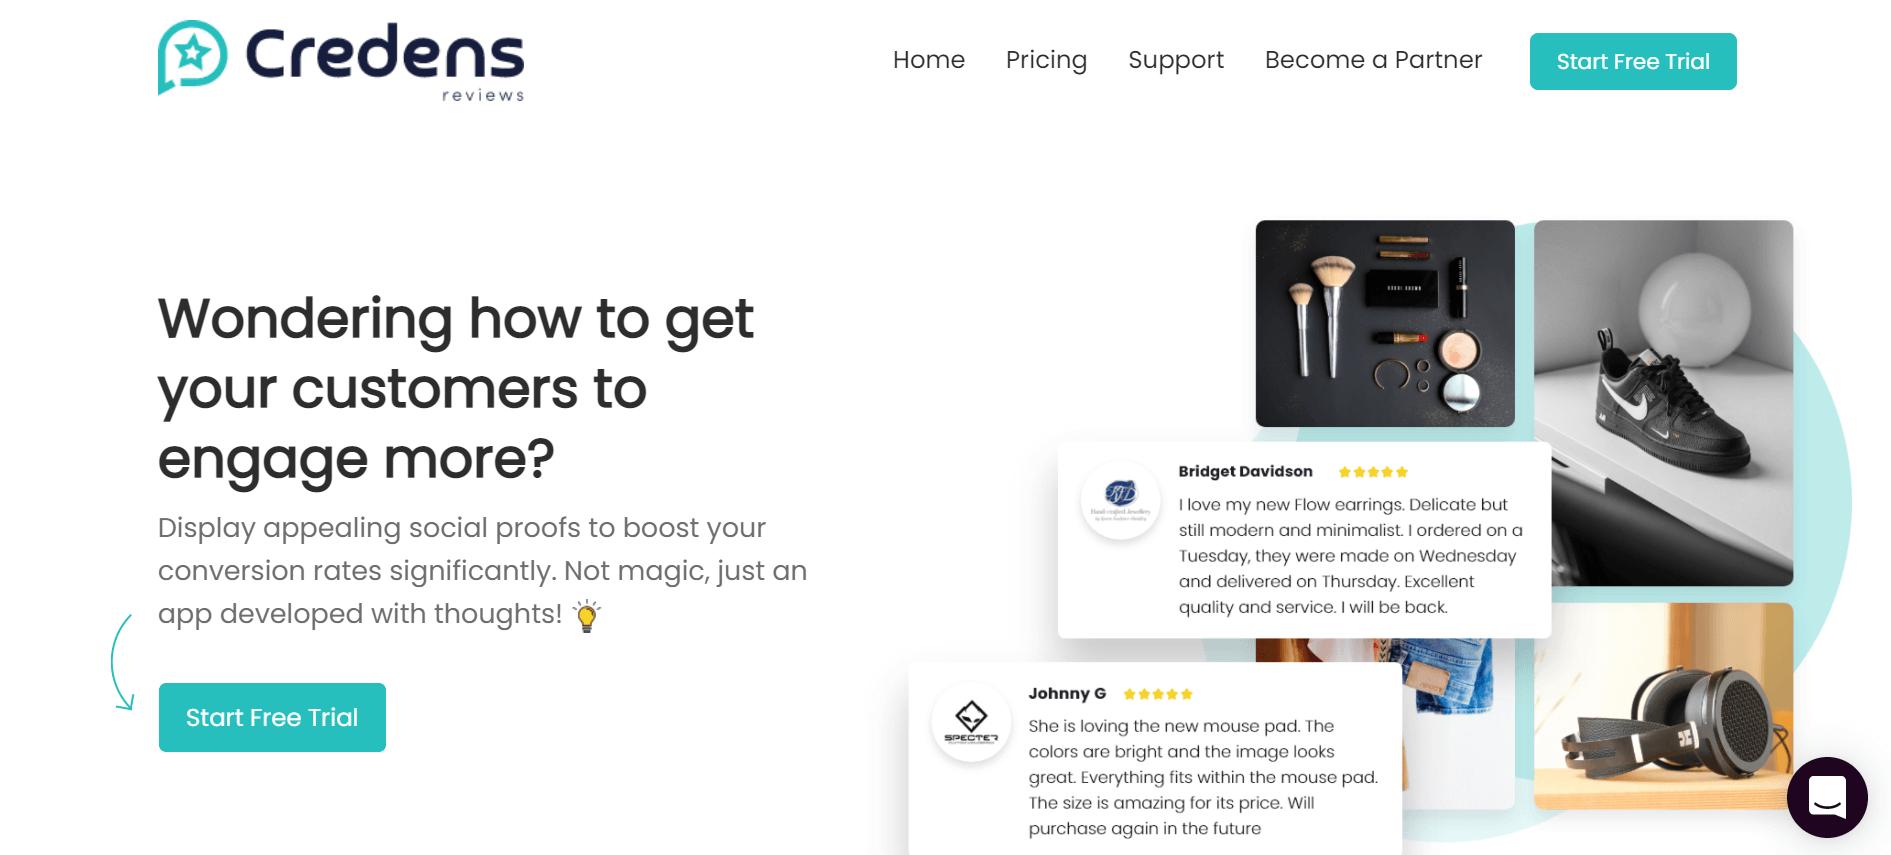 Credens app website above the fold